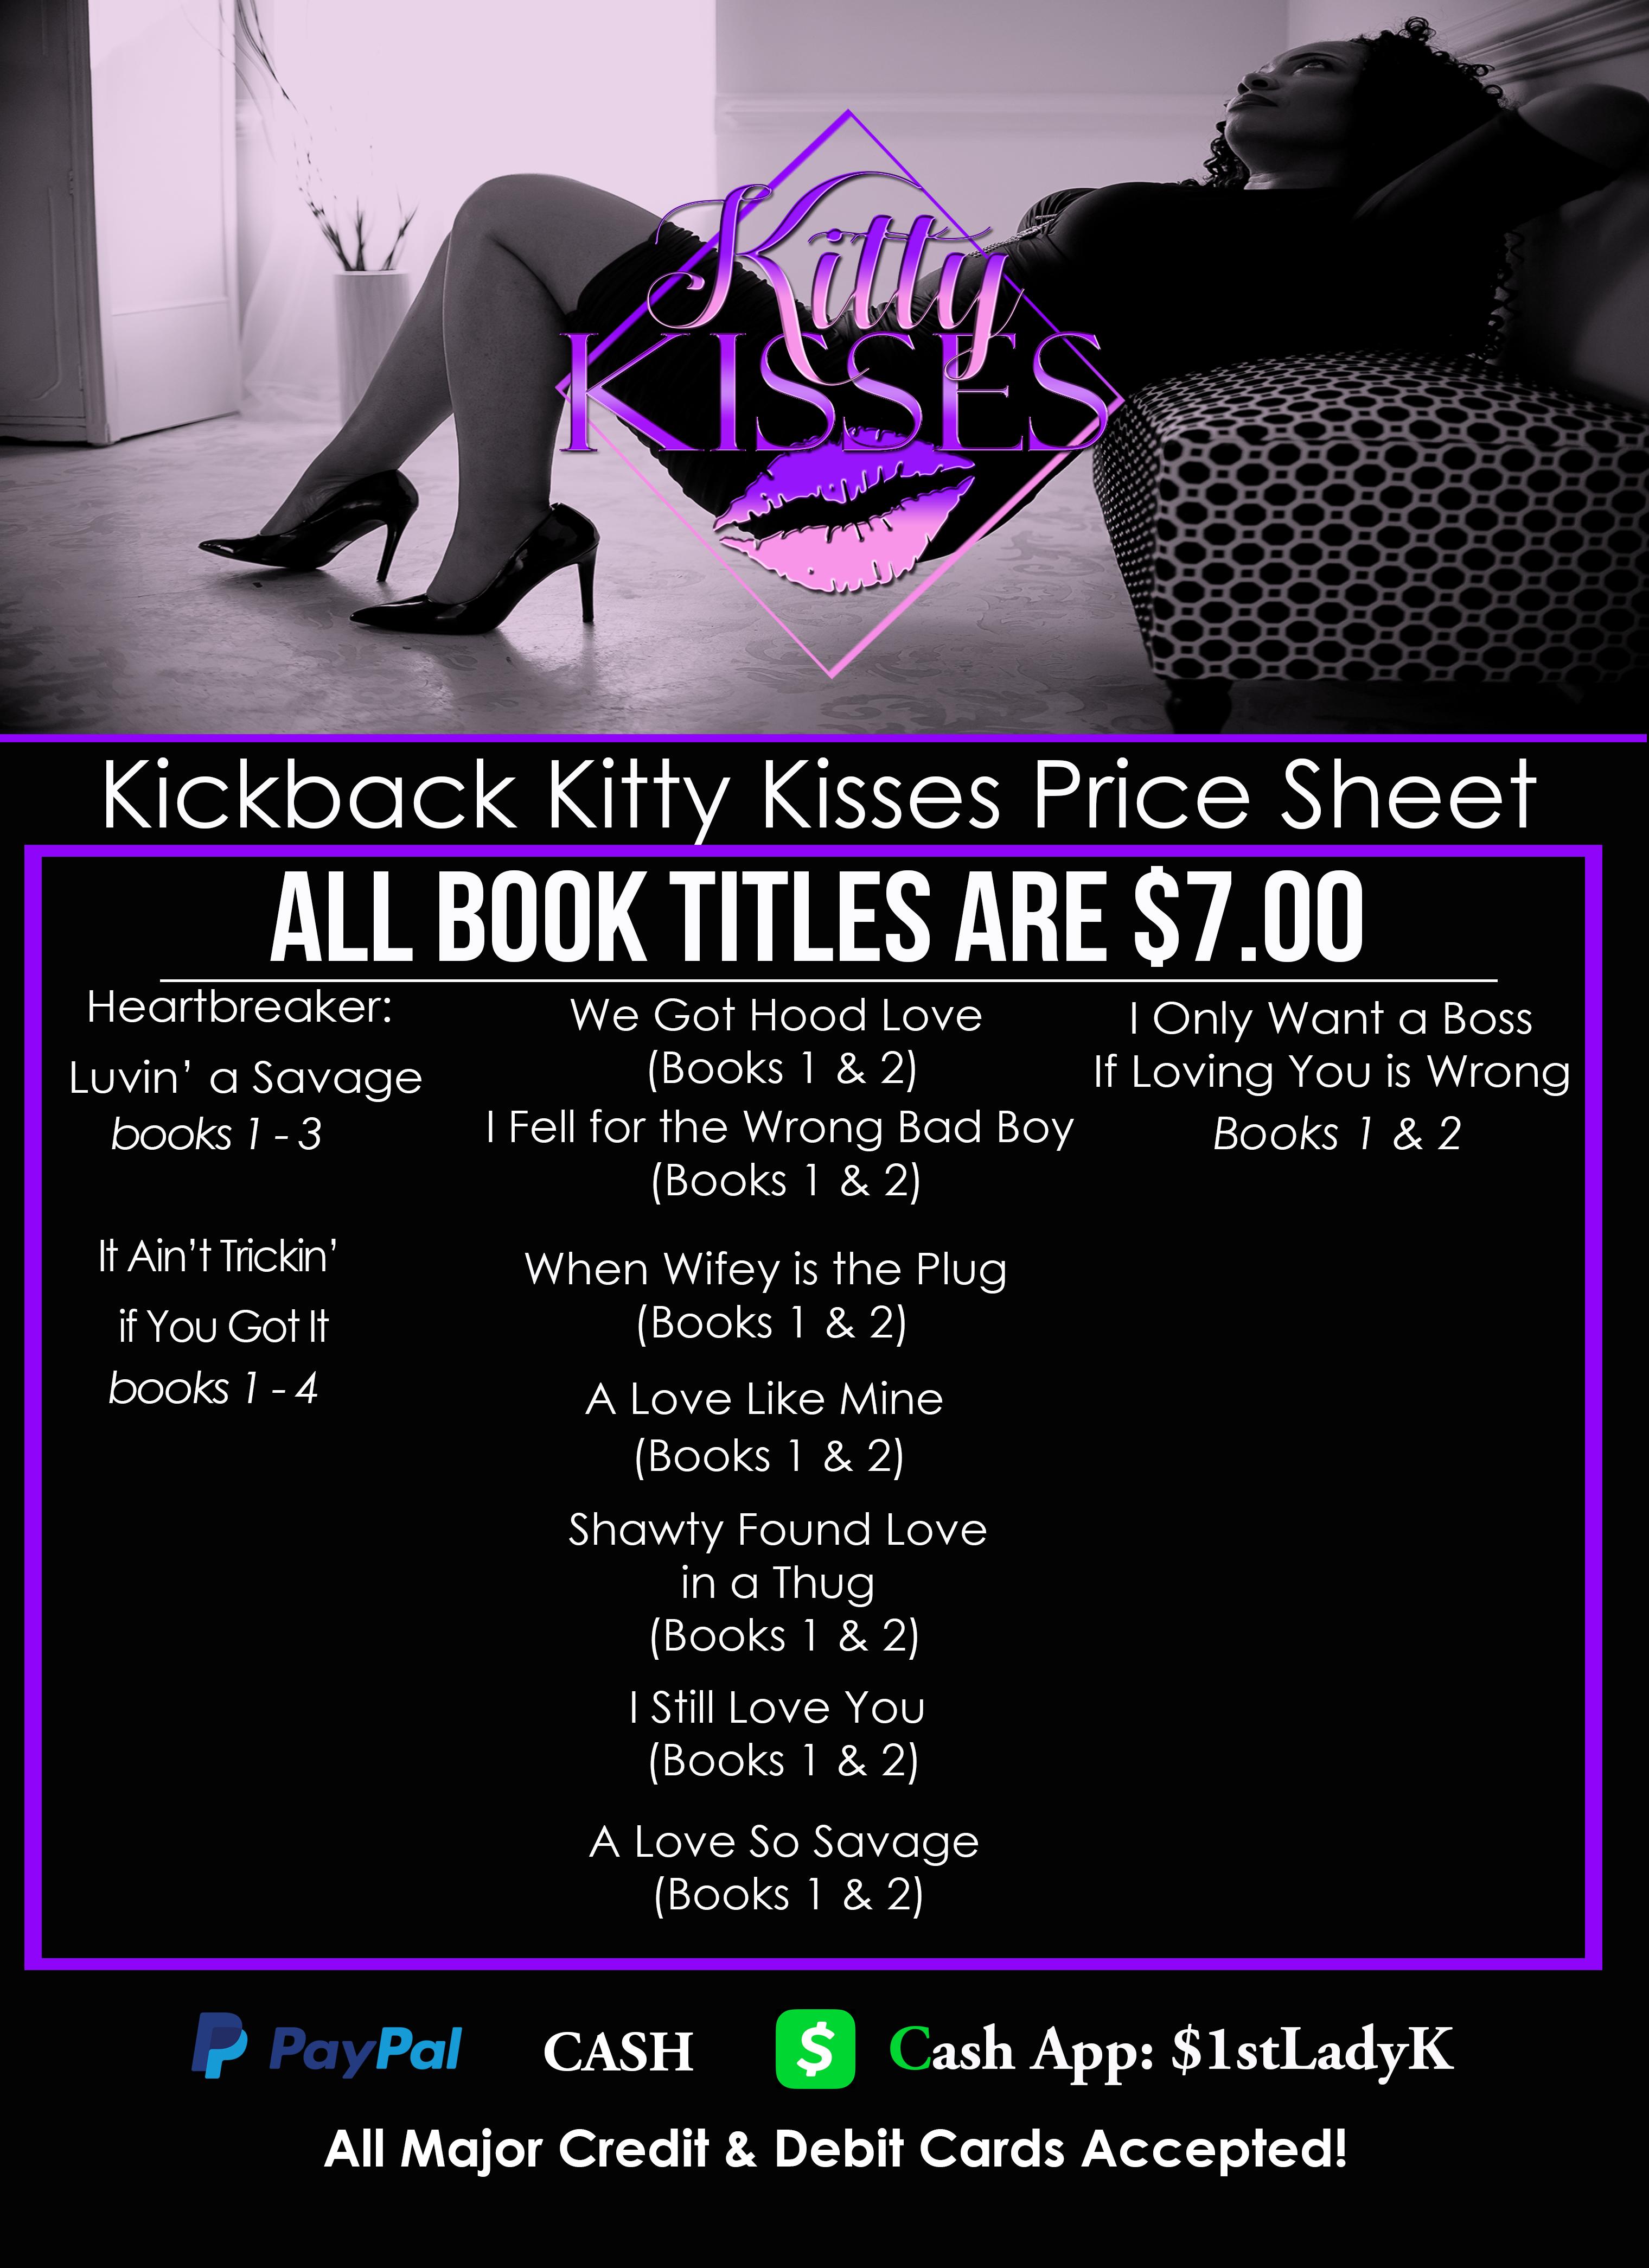 KICKBACK PRICING SHEET 7-12-18